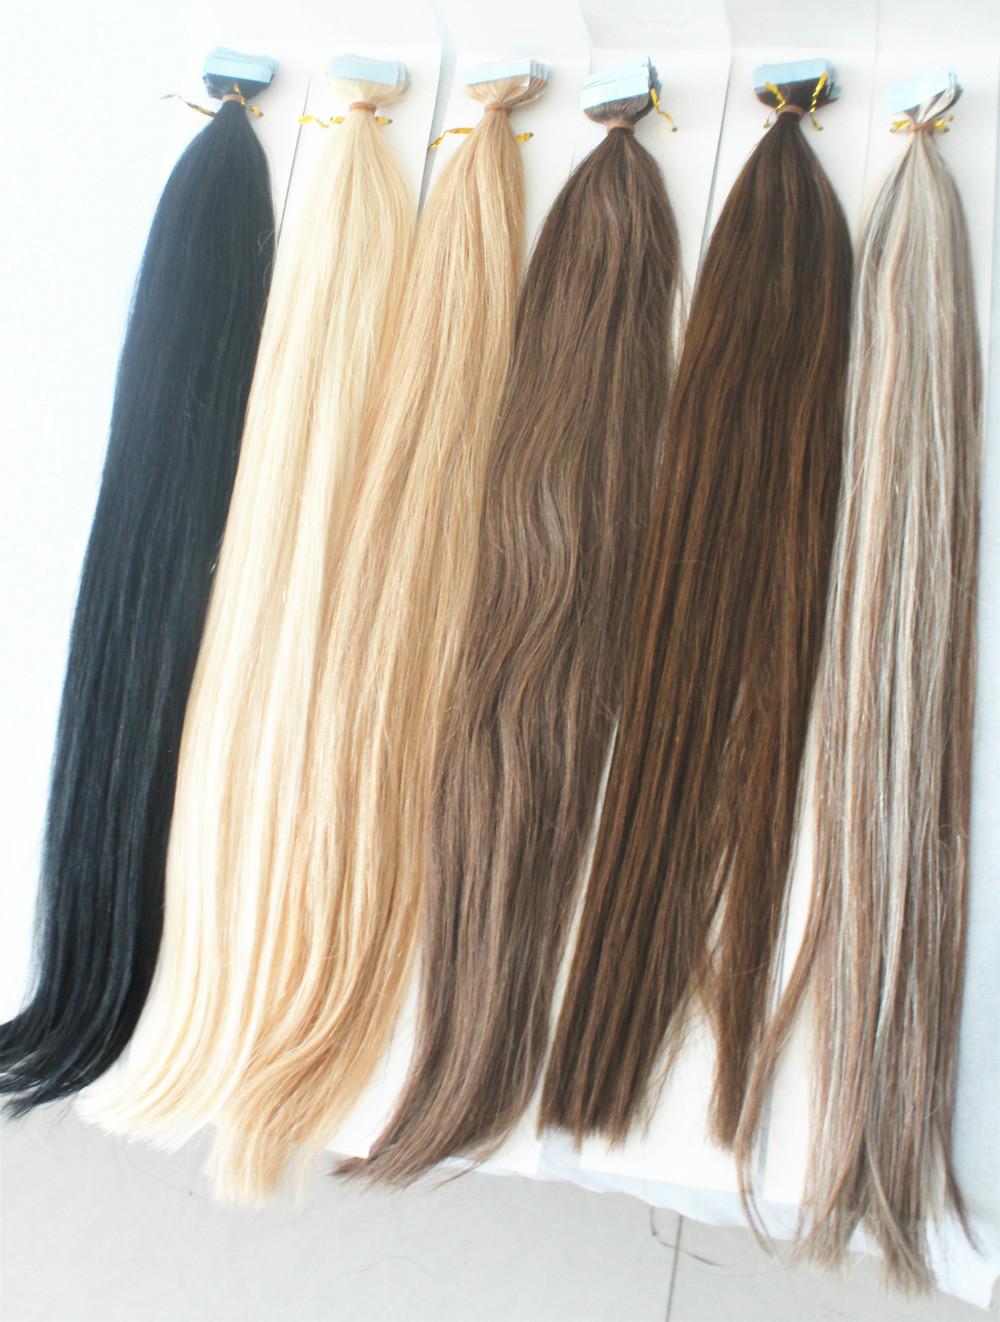 Cheap Tape Hair Extensions,Natural Human Hair on tape 40pcs 100g Silky Straight Brazilian Virgin ...